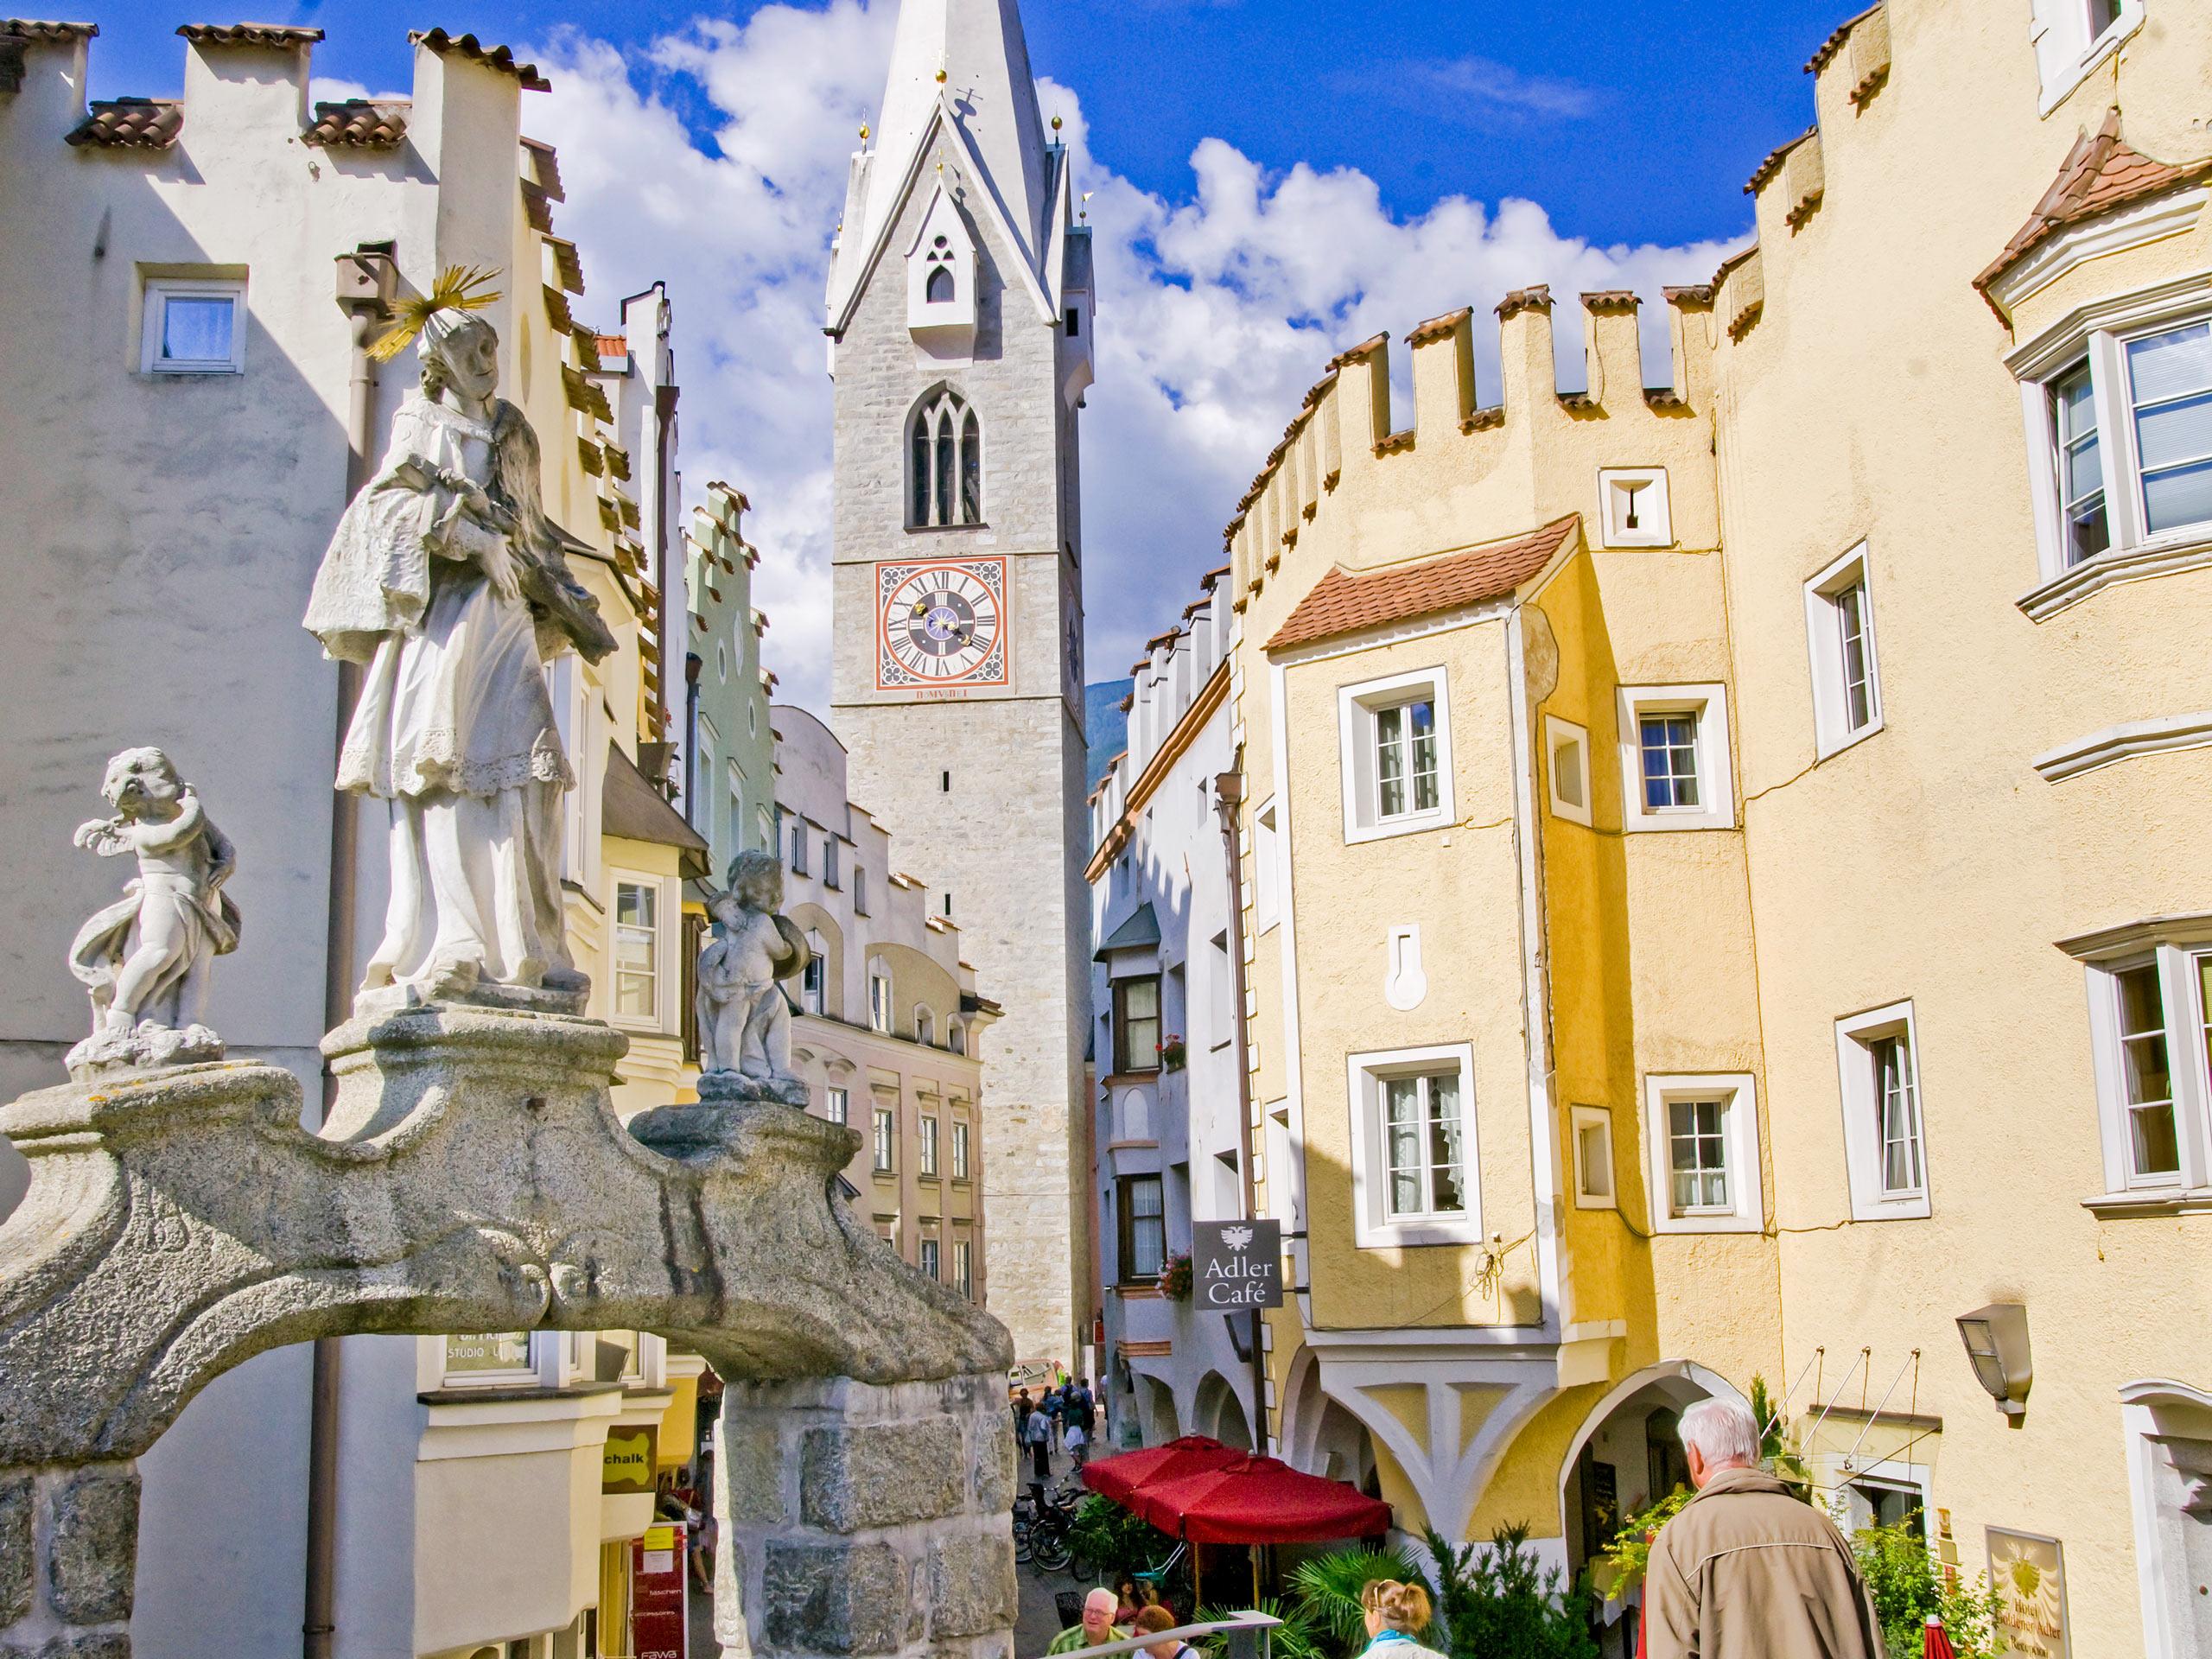 Brixen architecture